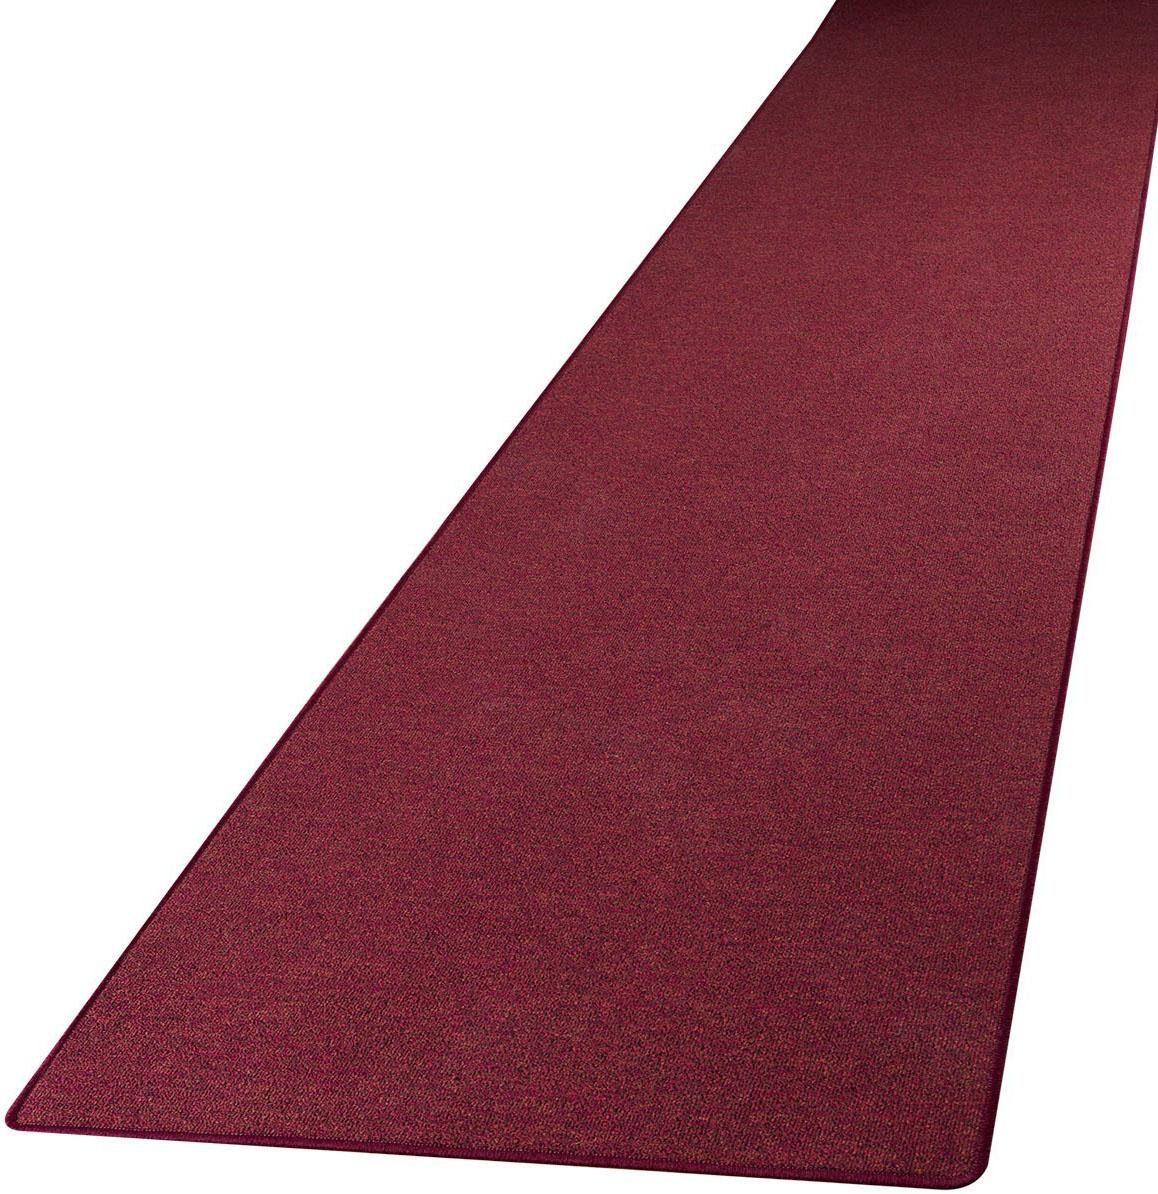 Teppich »Torronto«, Living Line, rechteckig, Höhe 5 mm